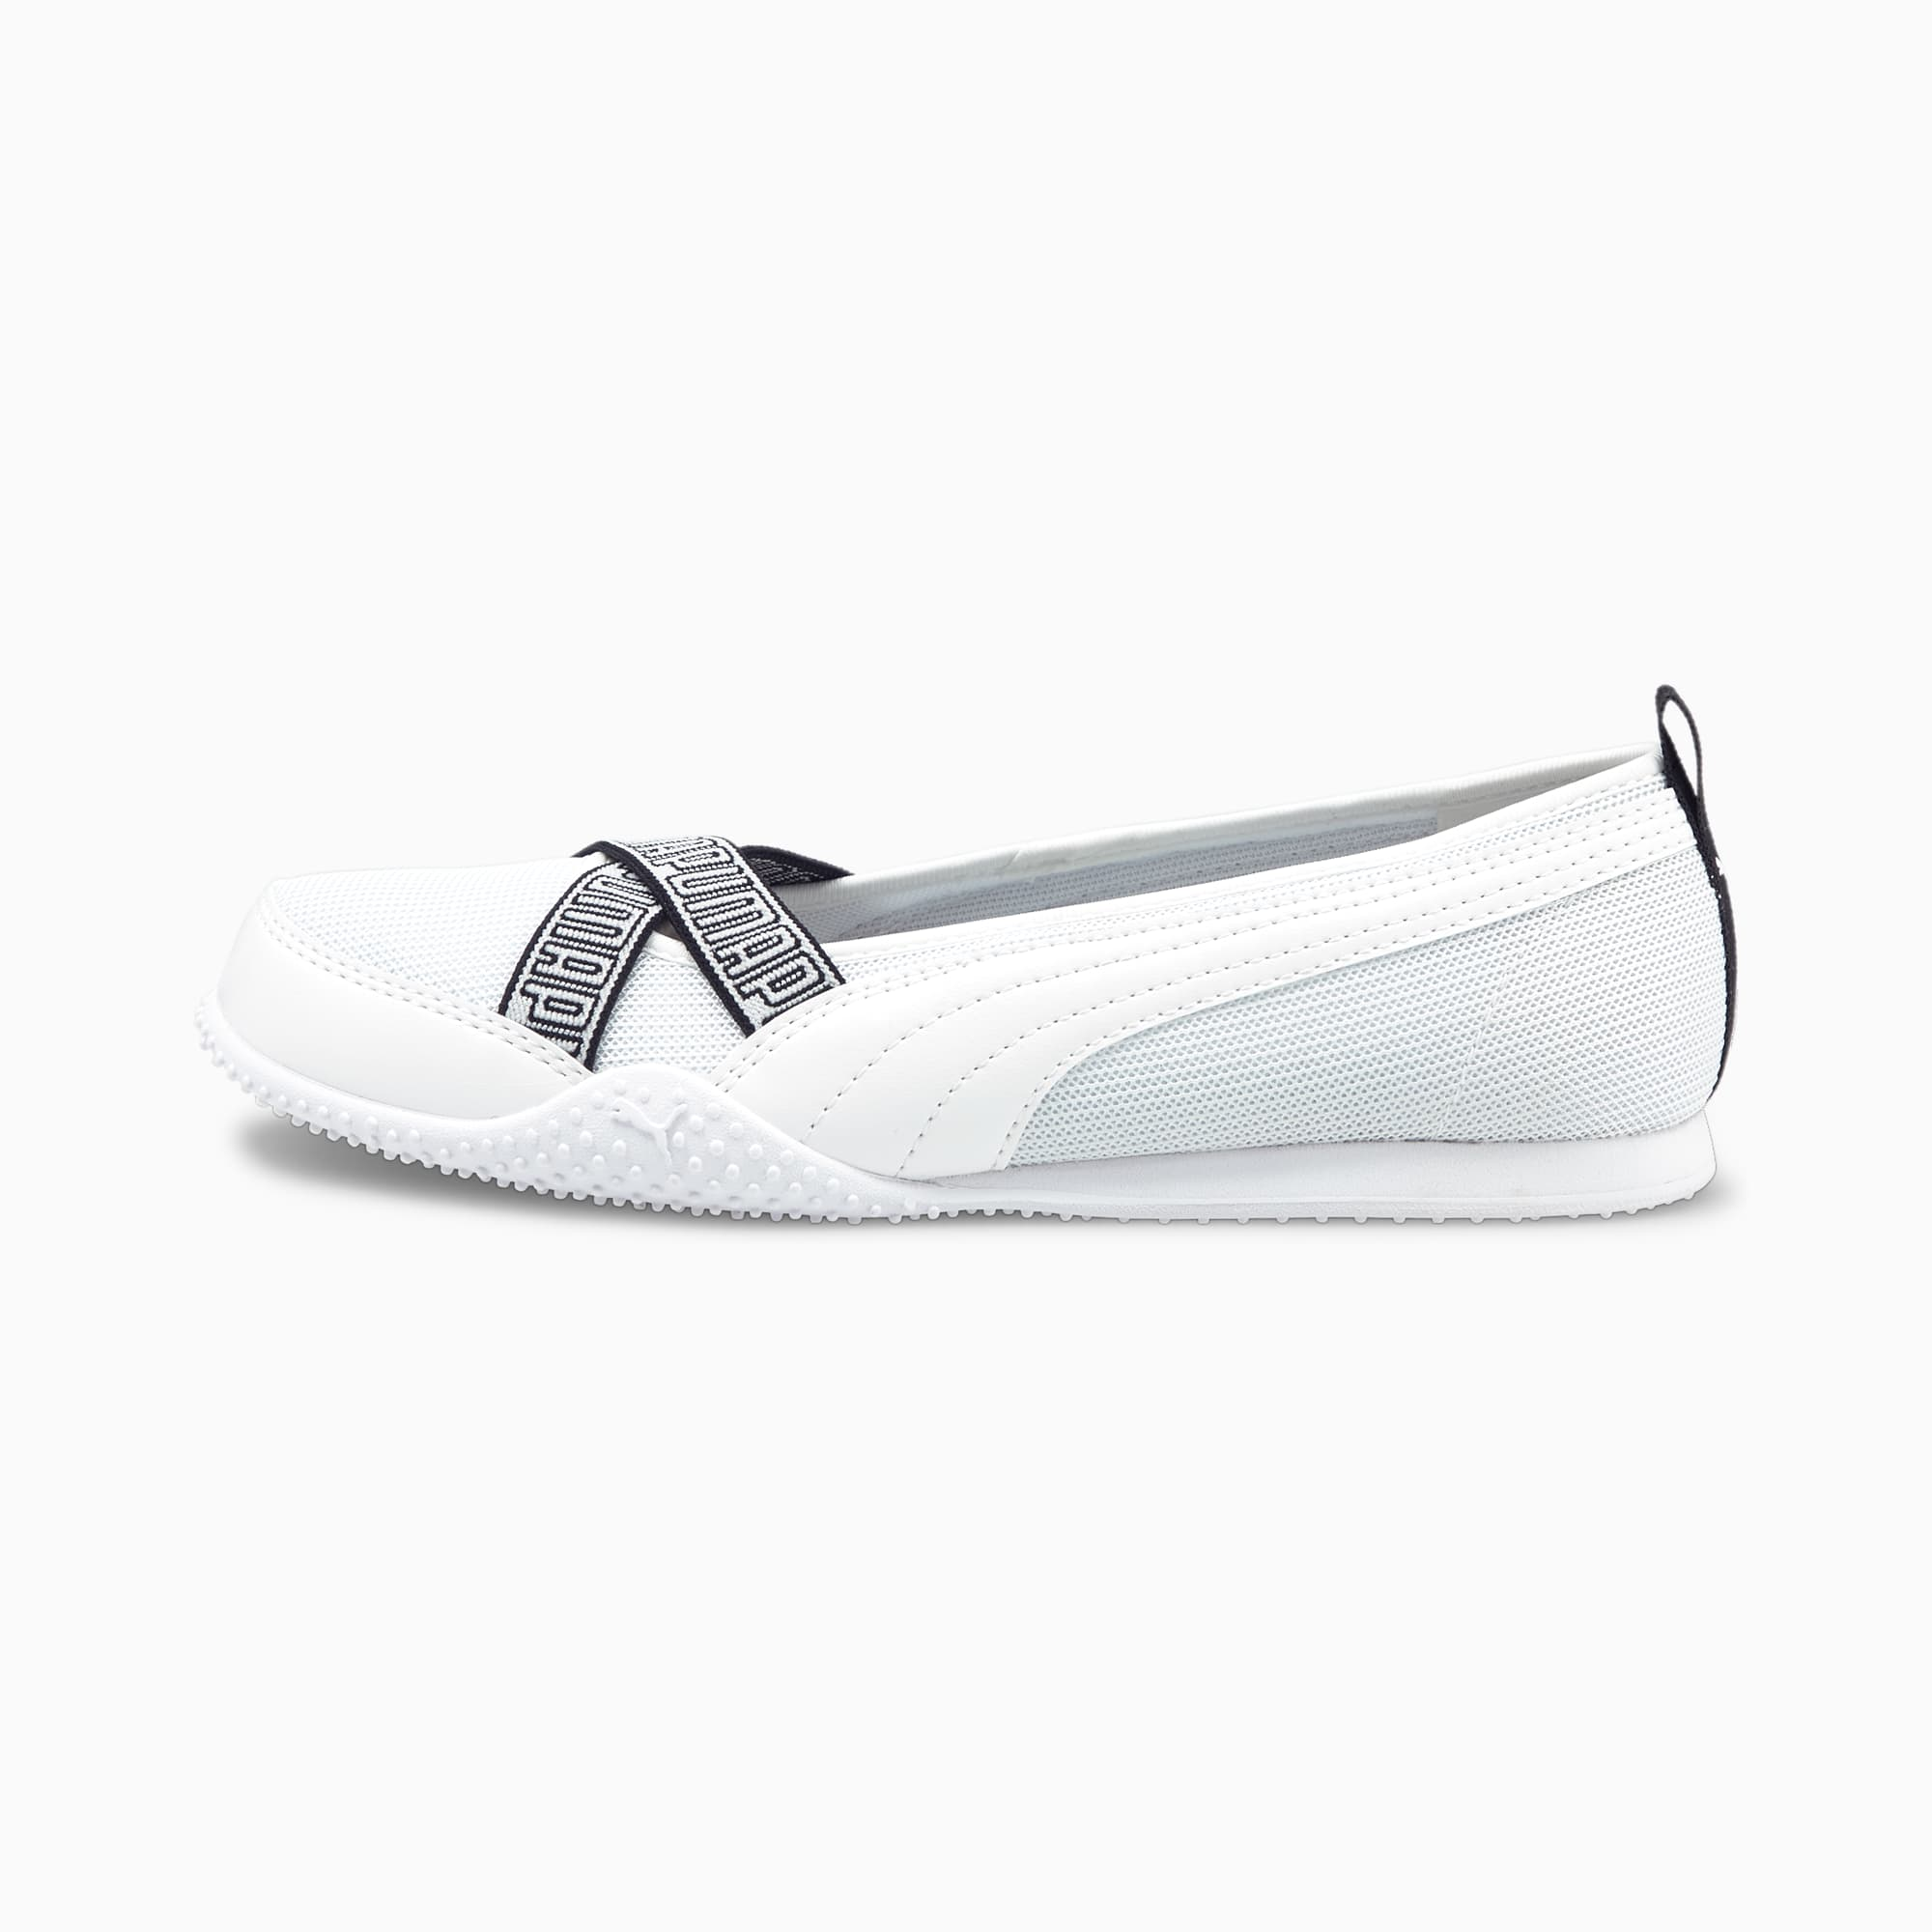 Bella Women's Ballerina Shoes